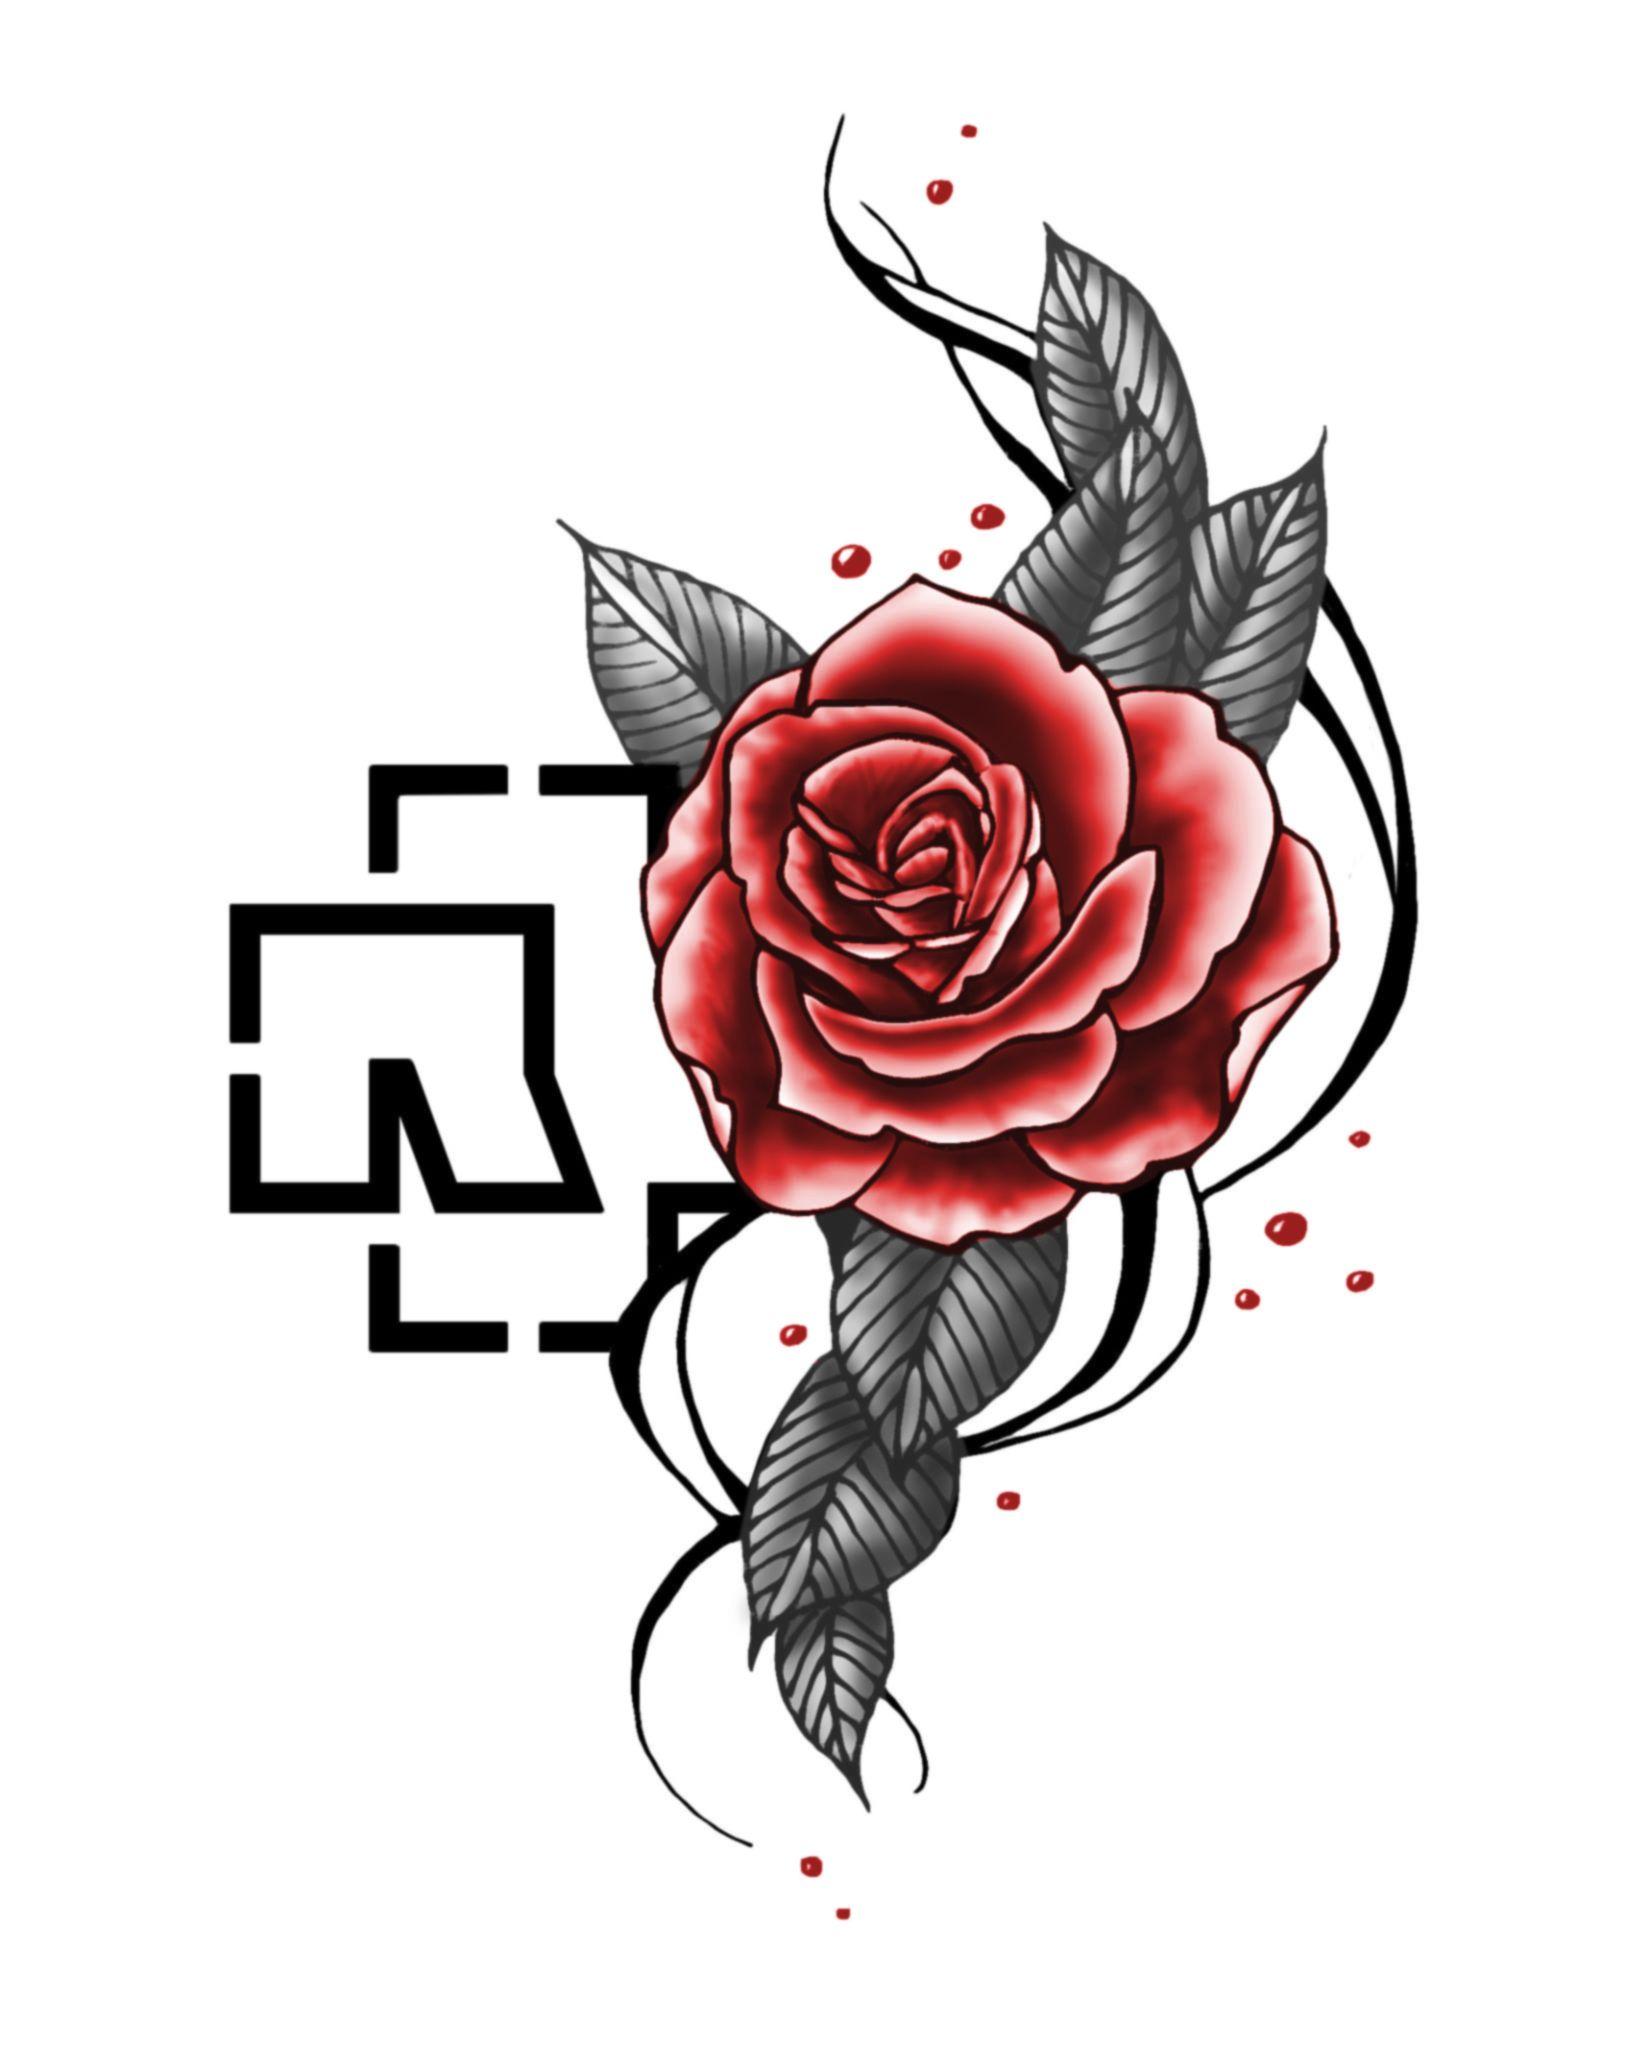 rammstein rosenrot tattoo idea tattoo pinterest tattoo vorlagen tattoo ideen und m nner. Black Bedroom Furniture Sets. Home Design Ideas